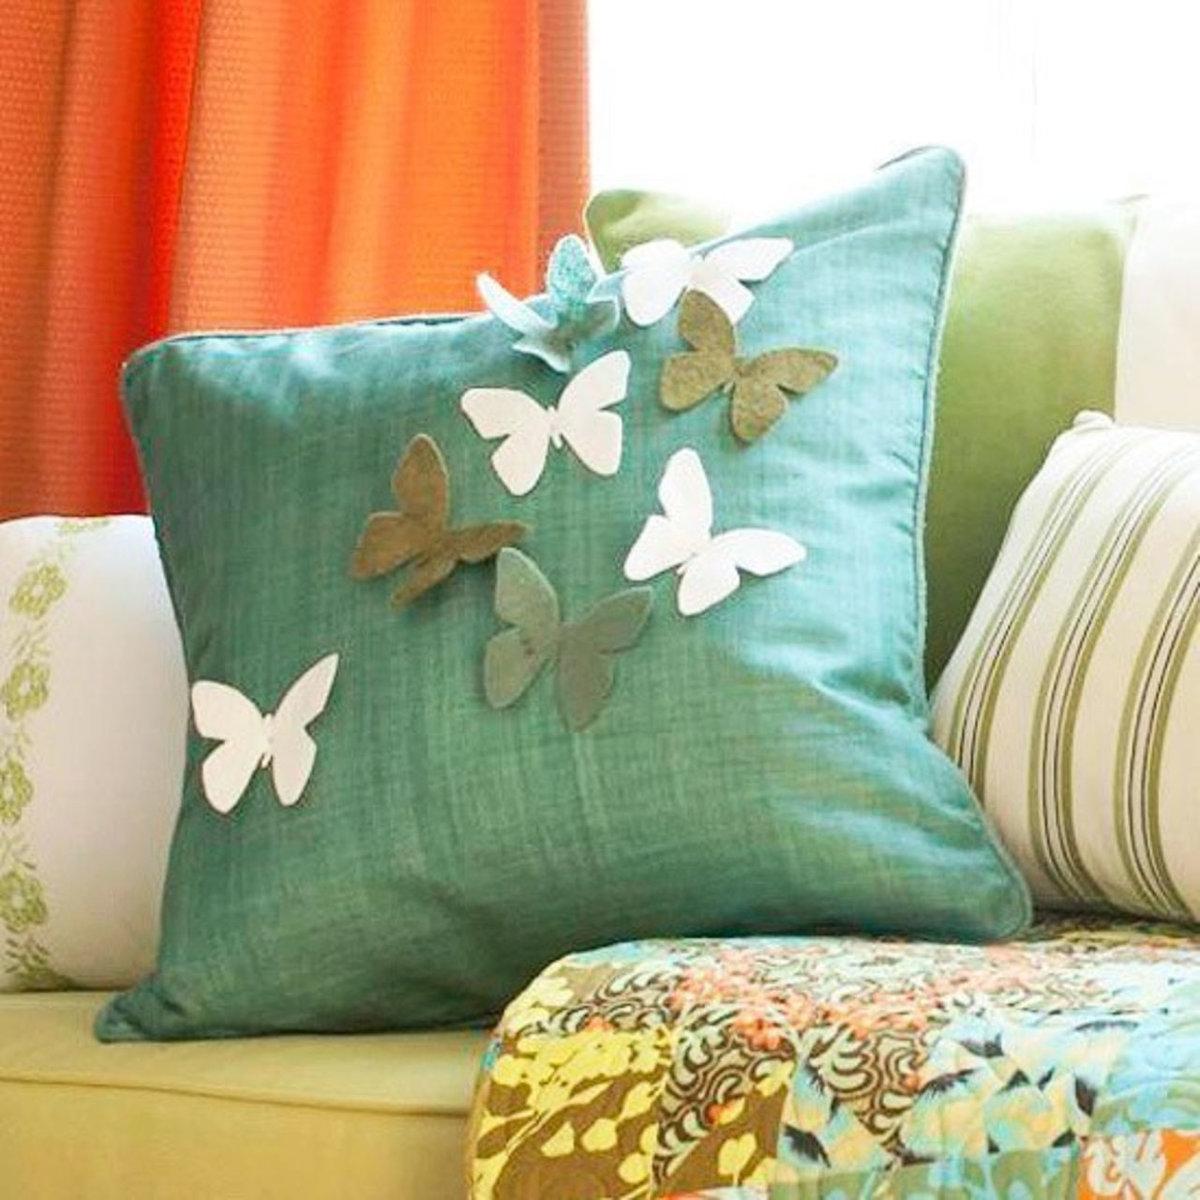 Красивые подушечки на диван своими руками